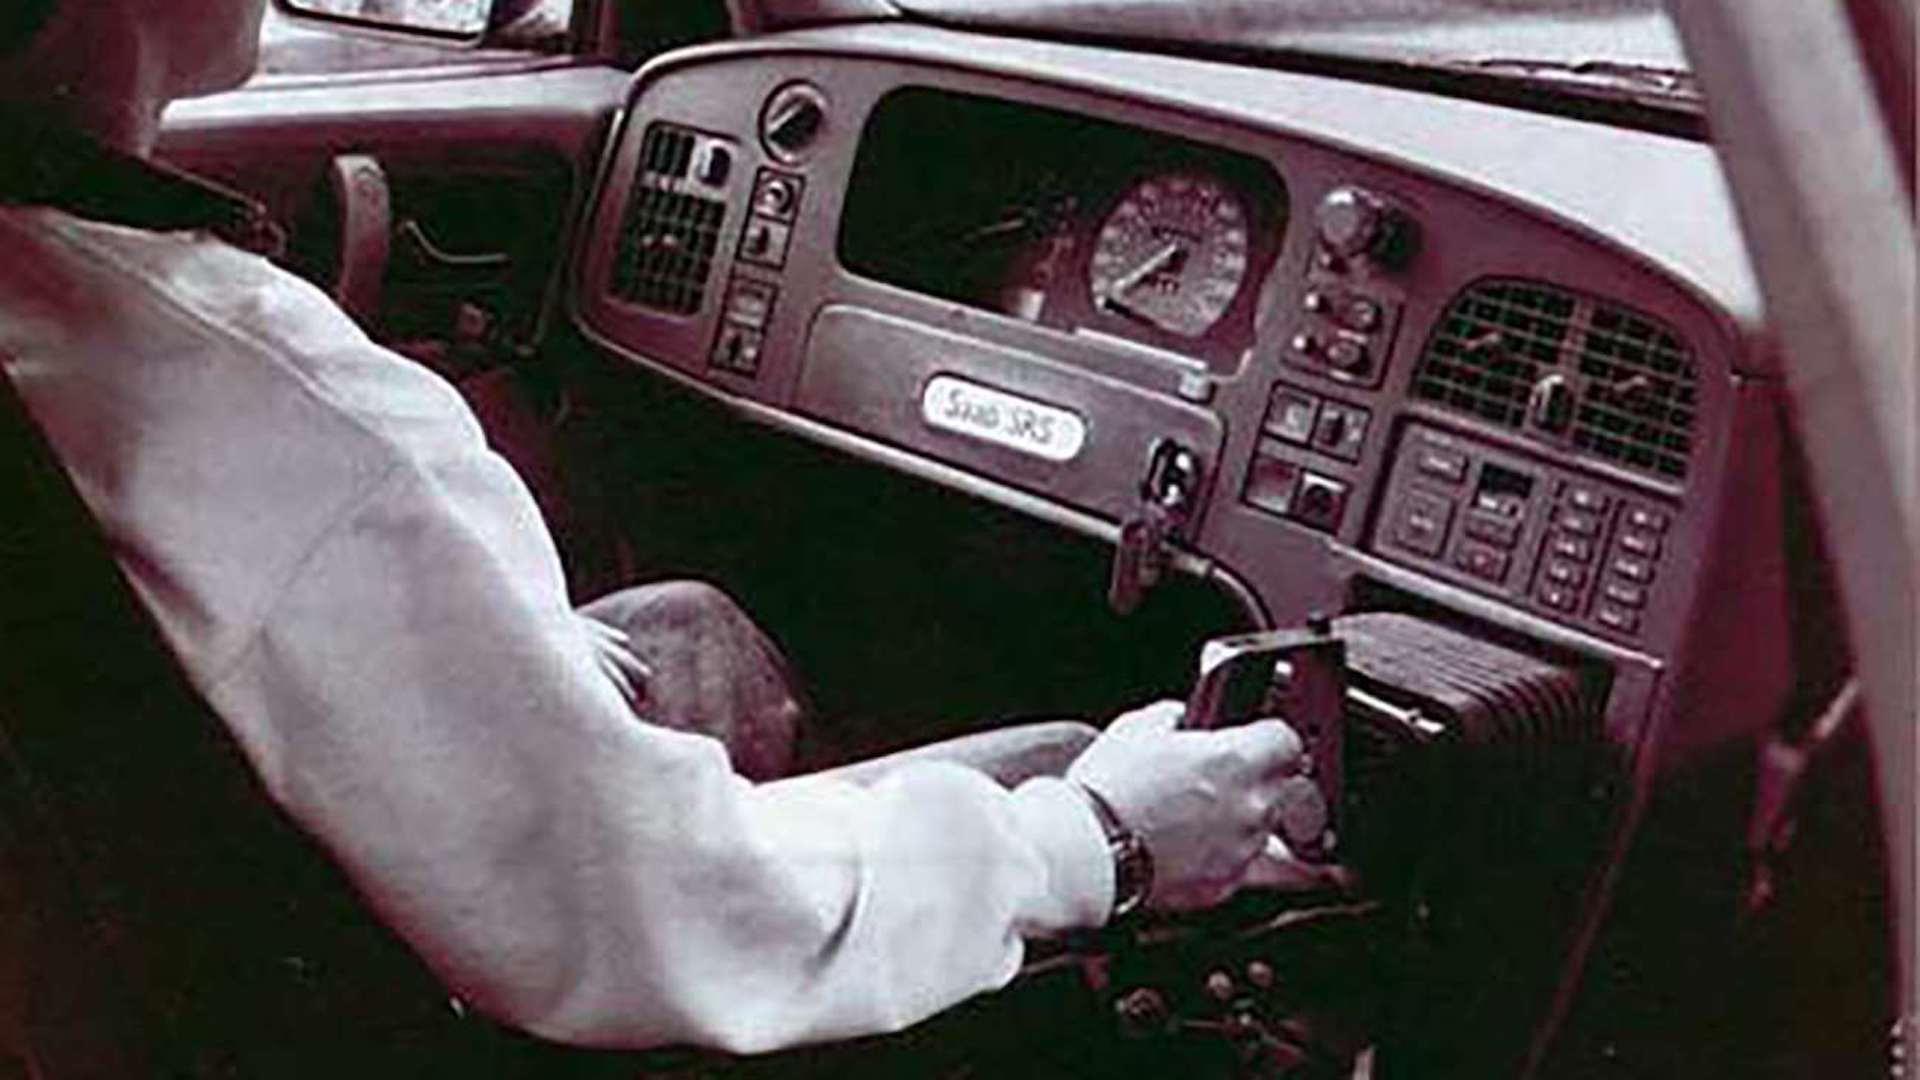 Saab 9000 with joystick driver control Photo: Goodwood